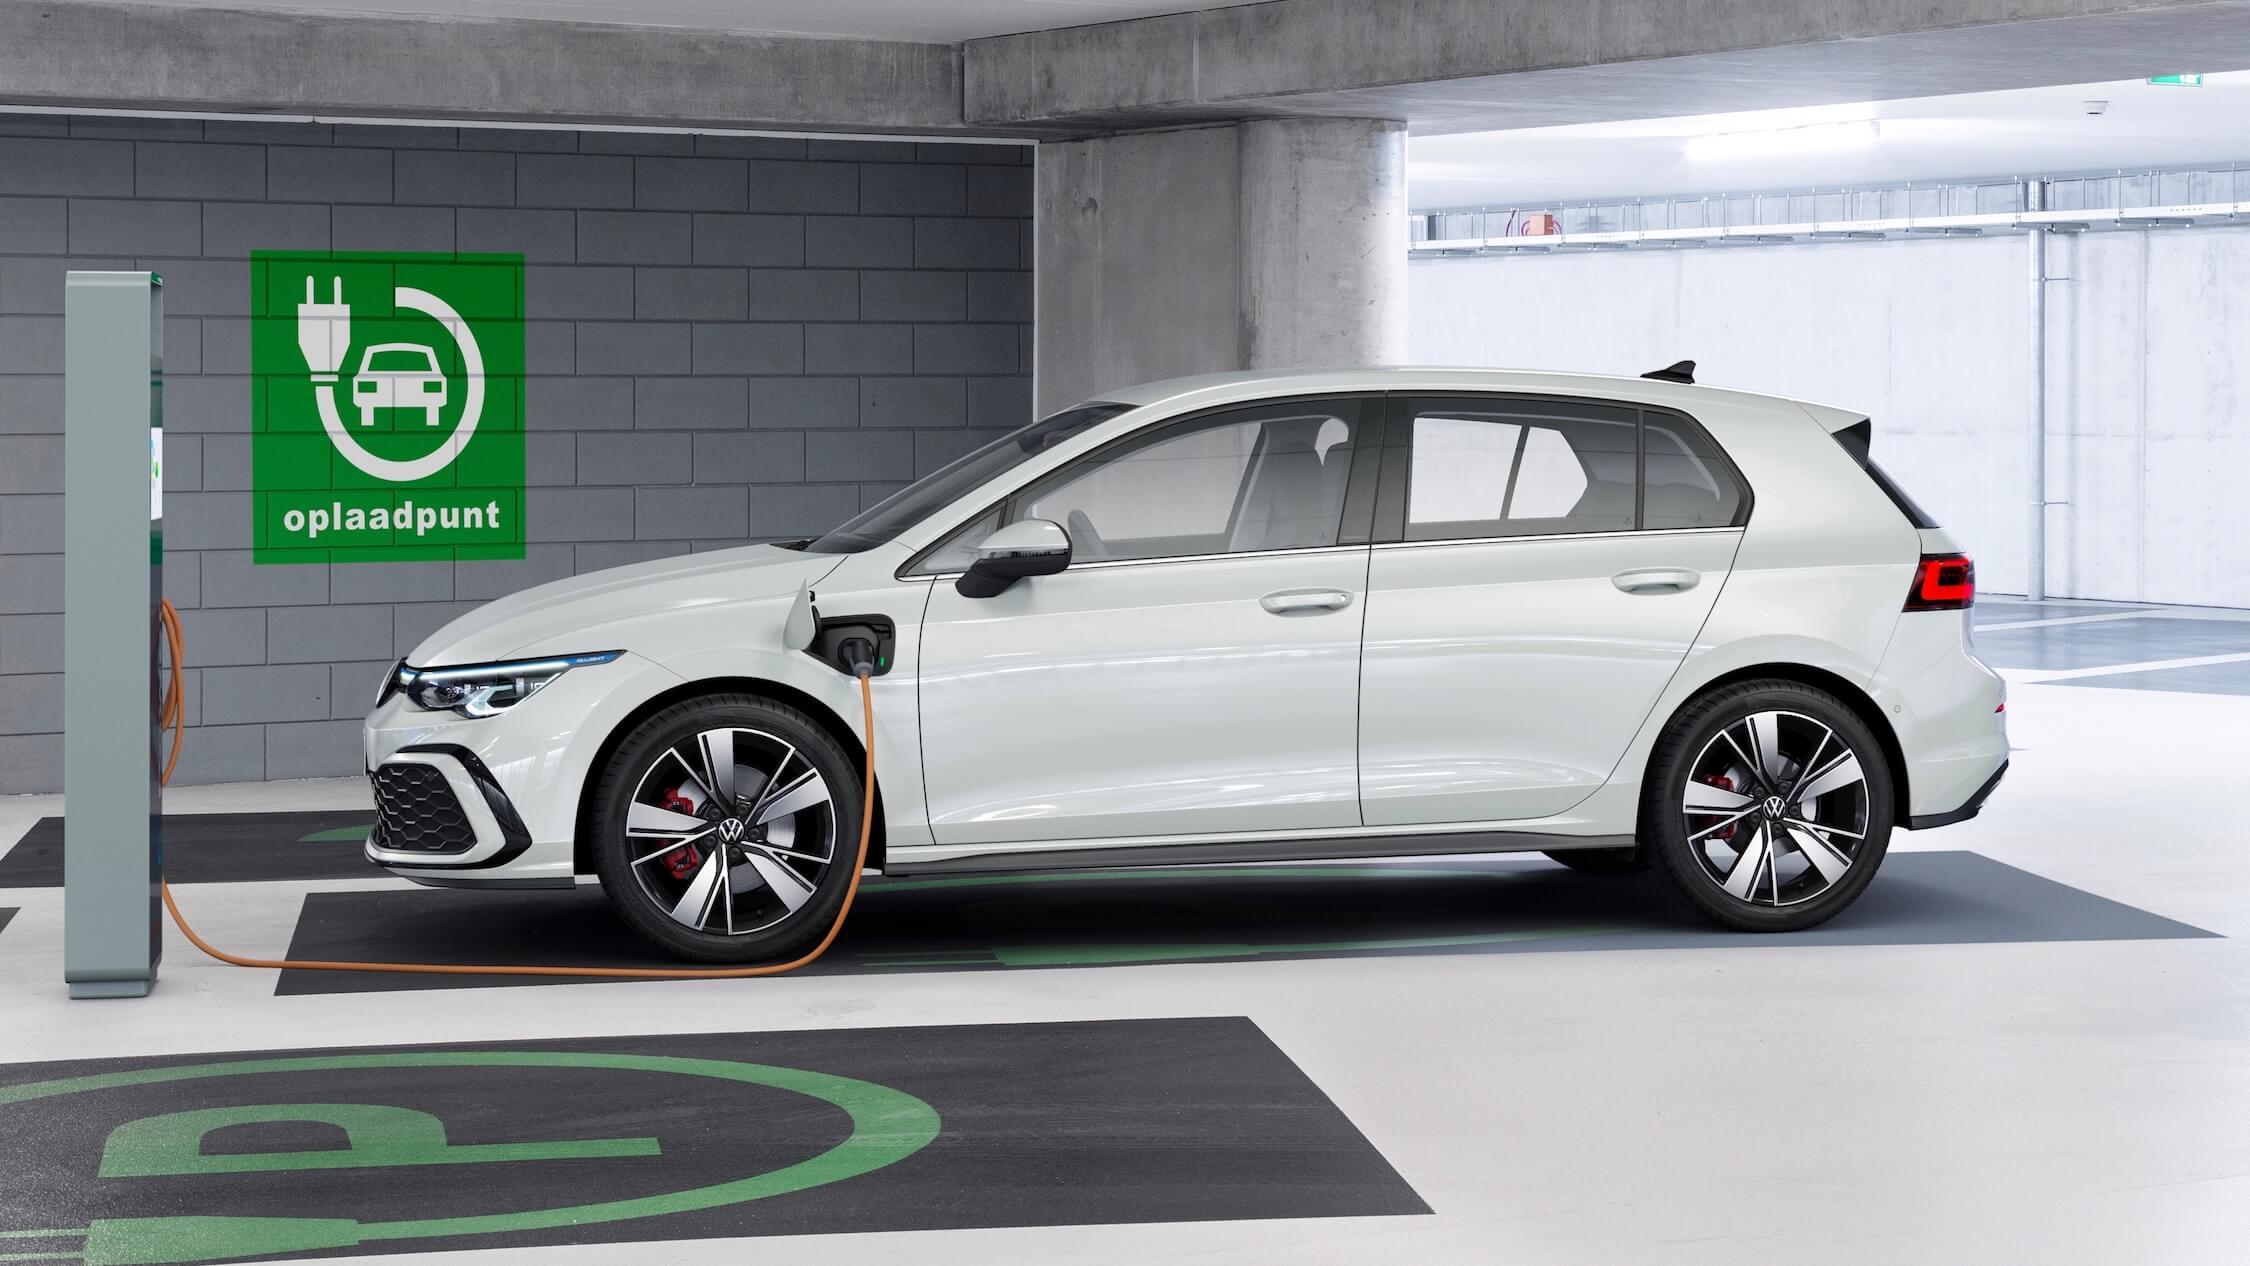 VW Golf GTE carregar